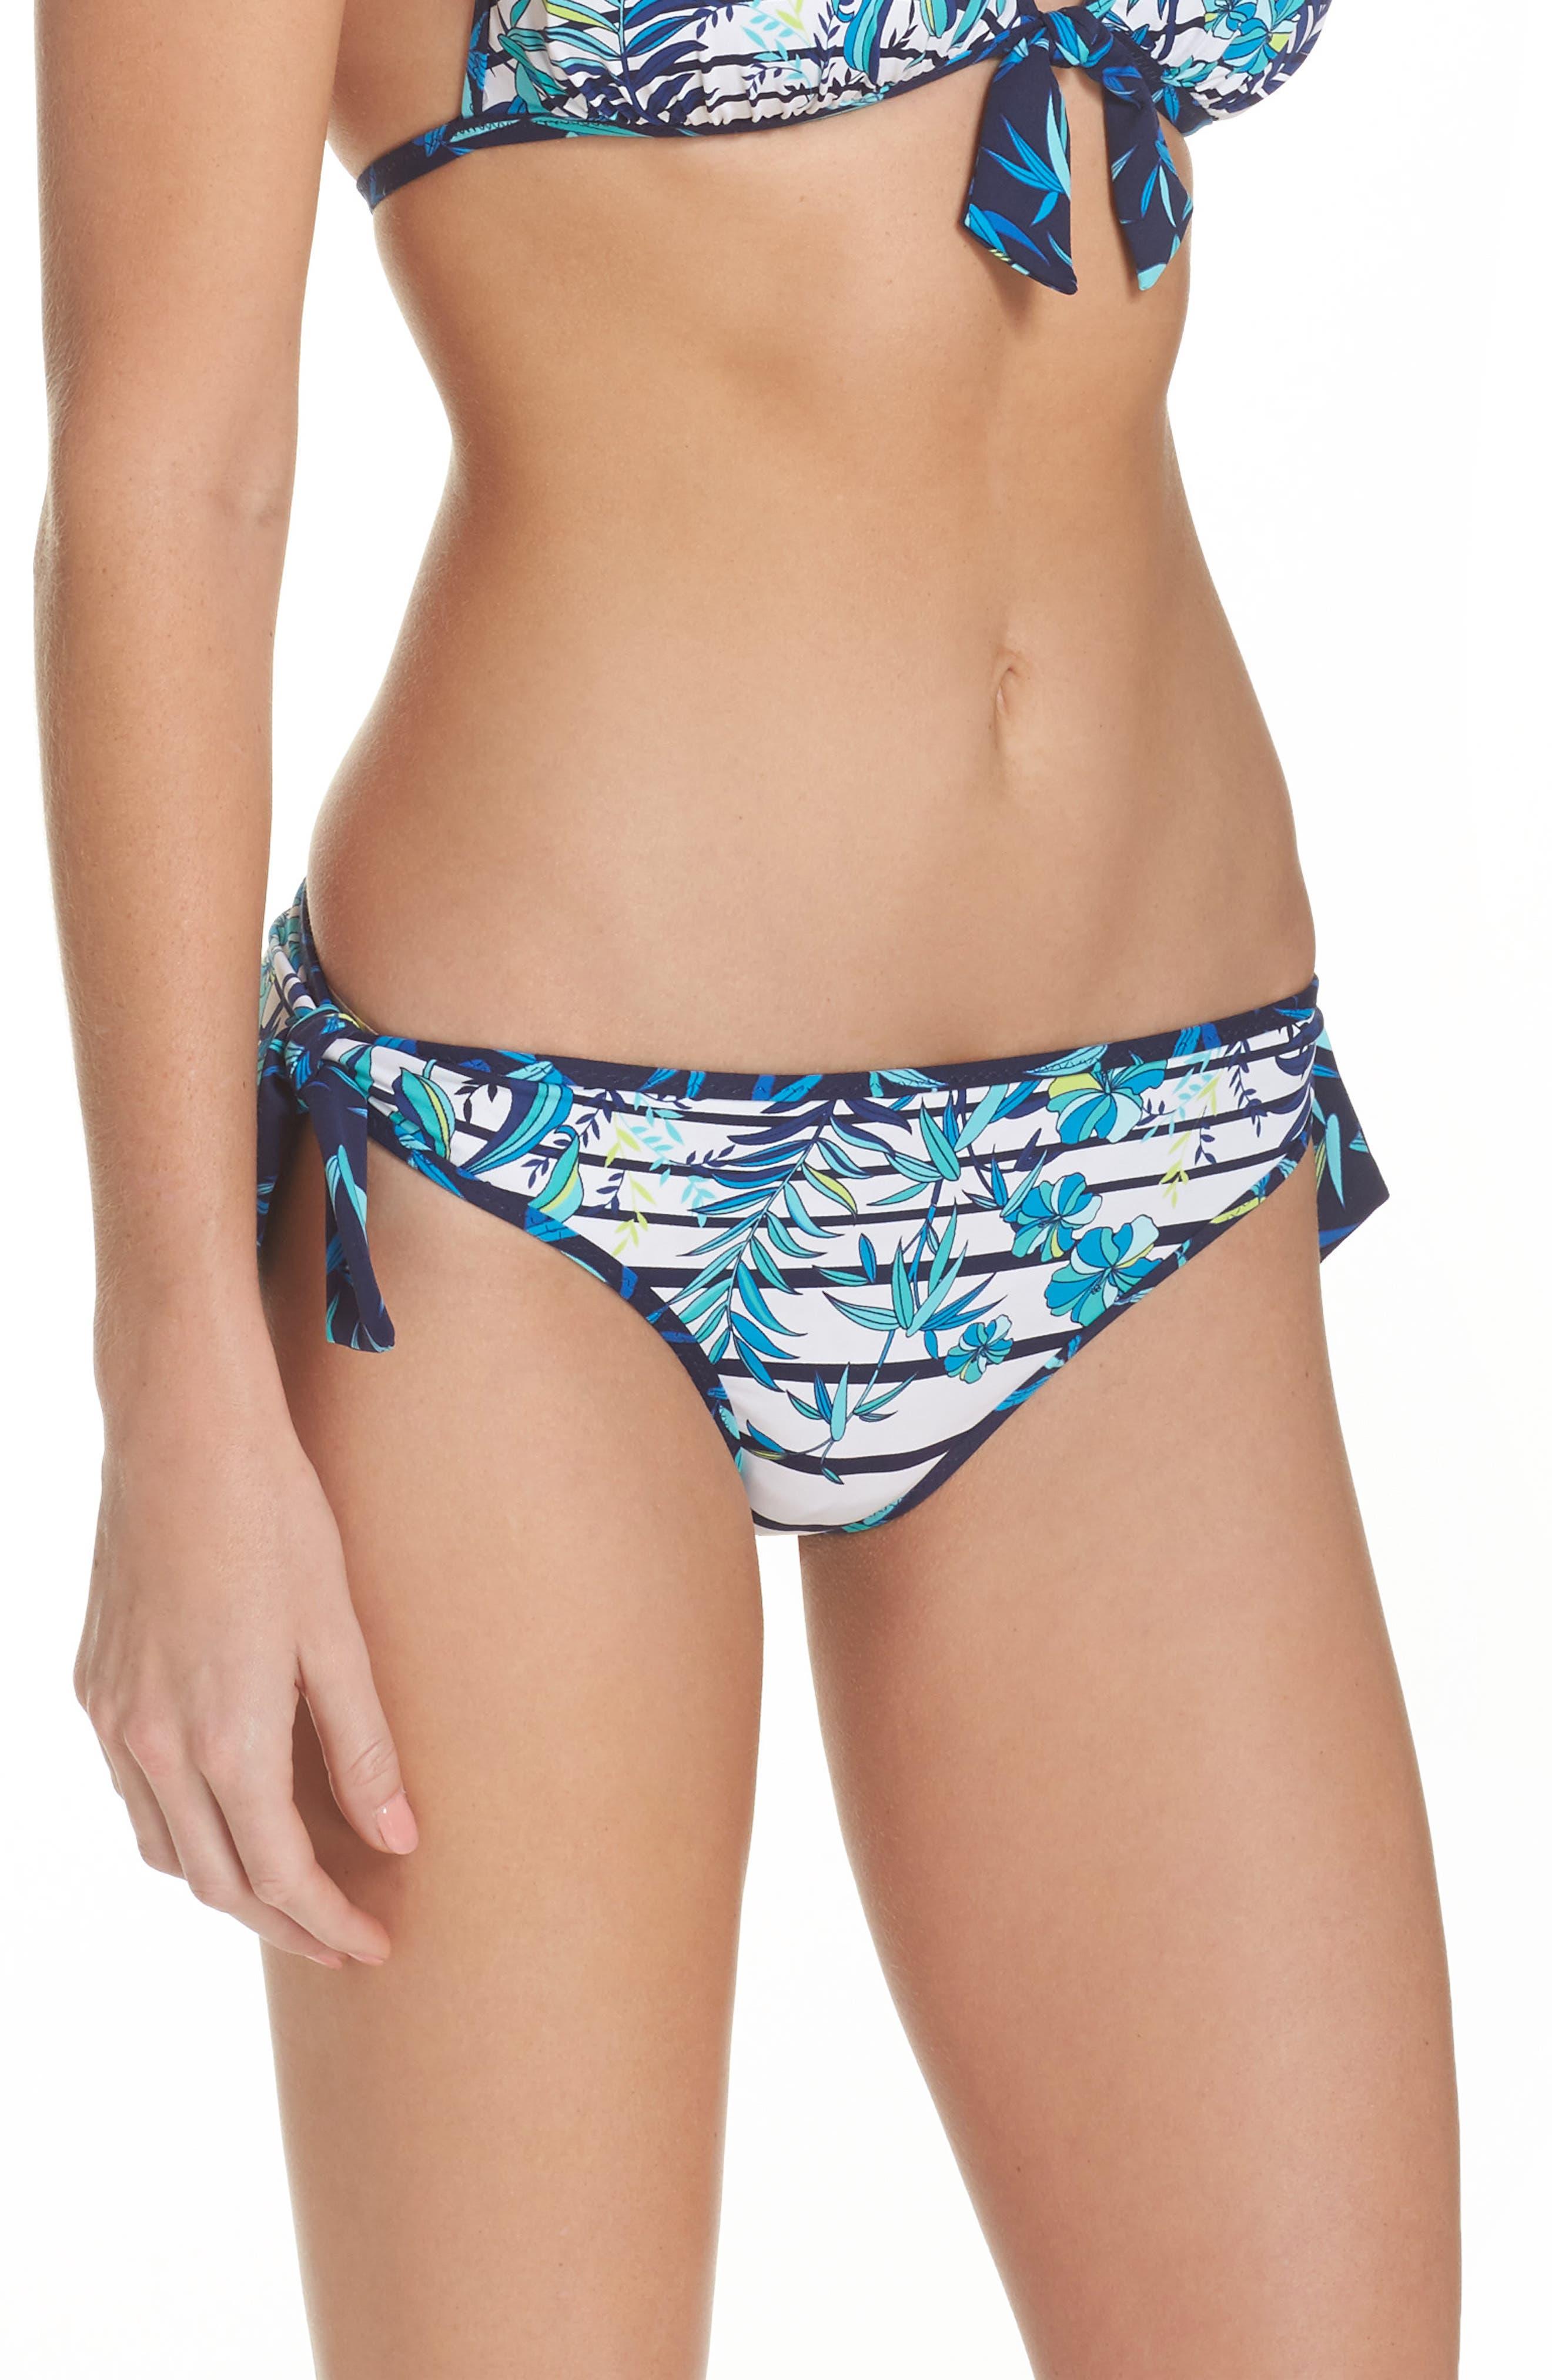 Tropical Swirl Reversible Bikini Bottoms,                             Alternate thumbnail 3, color,                             Blue/ White